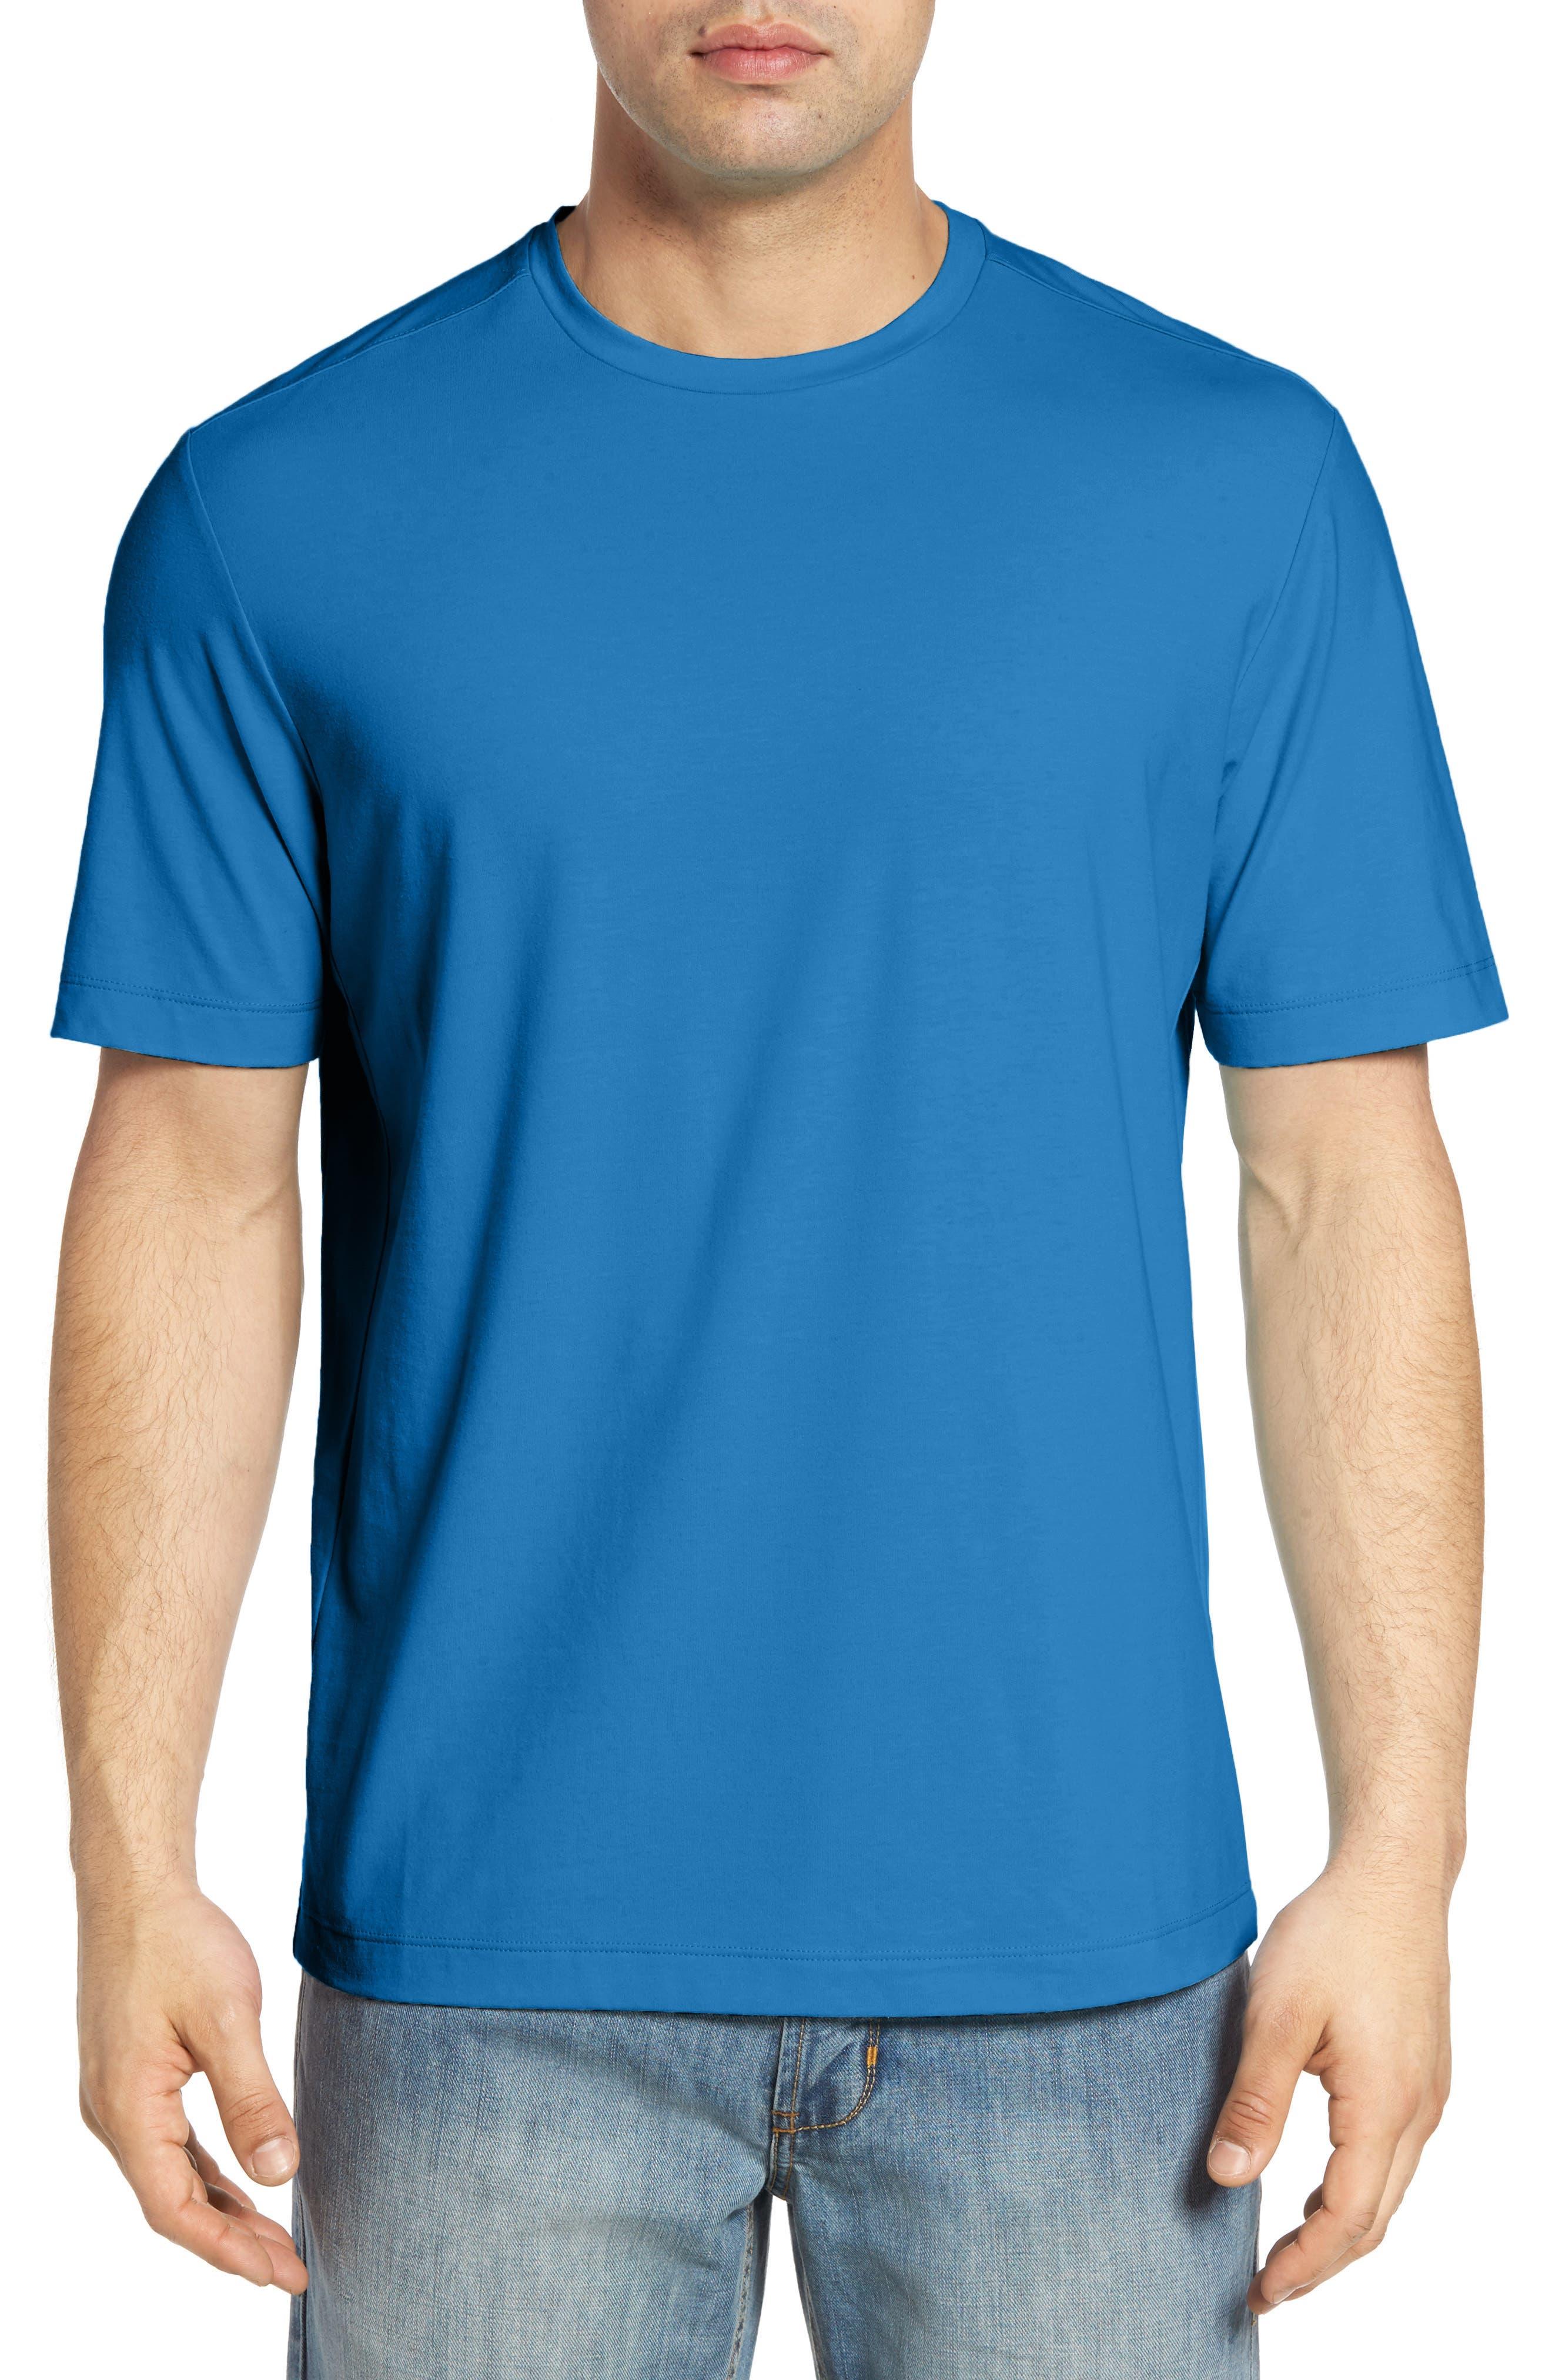 Tropicool T-Shirt,                             Main thumbnail 10, color,